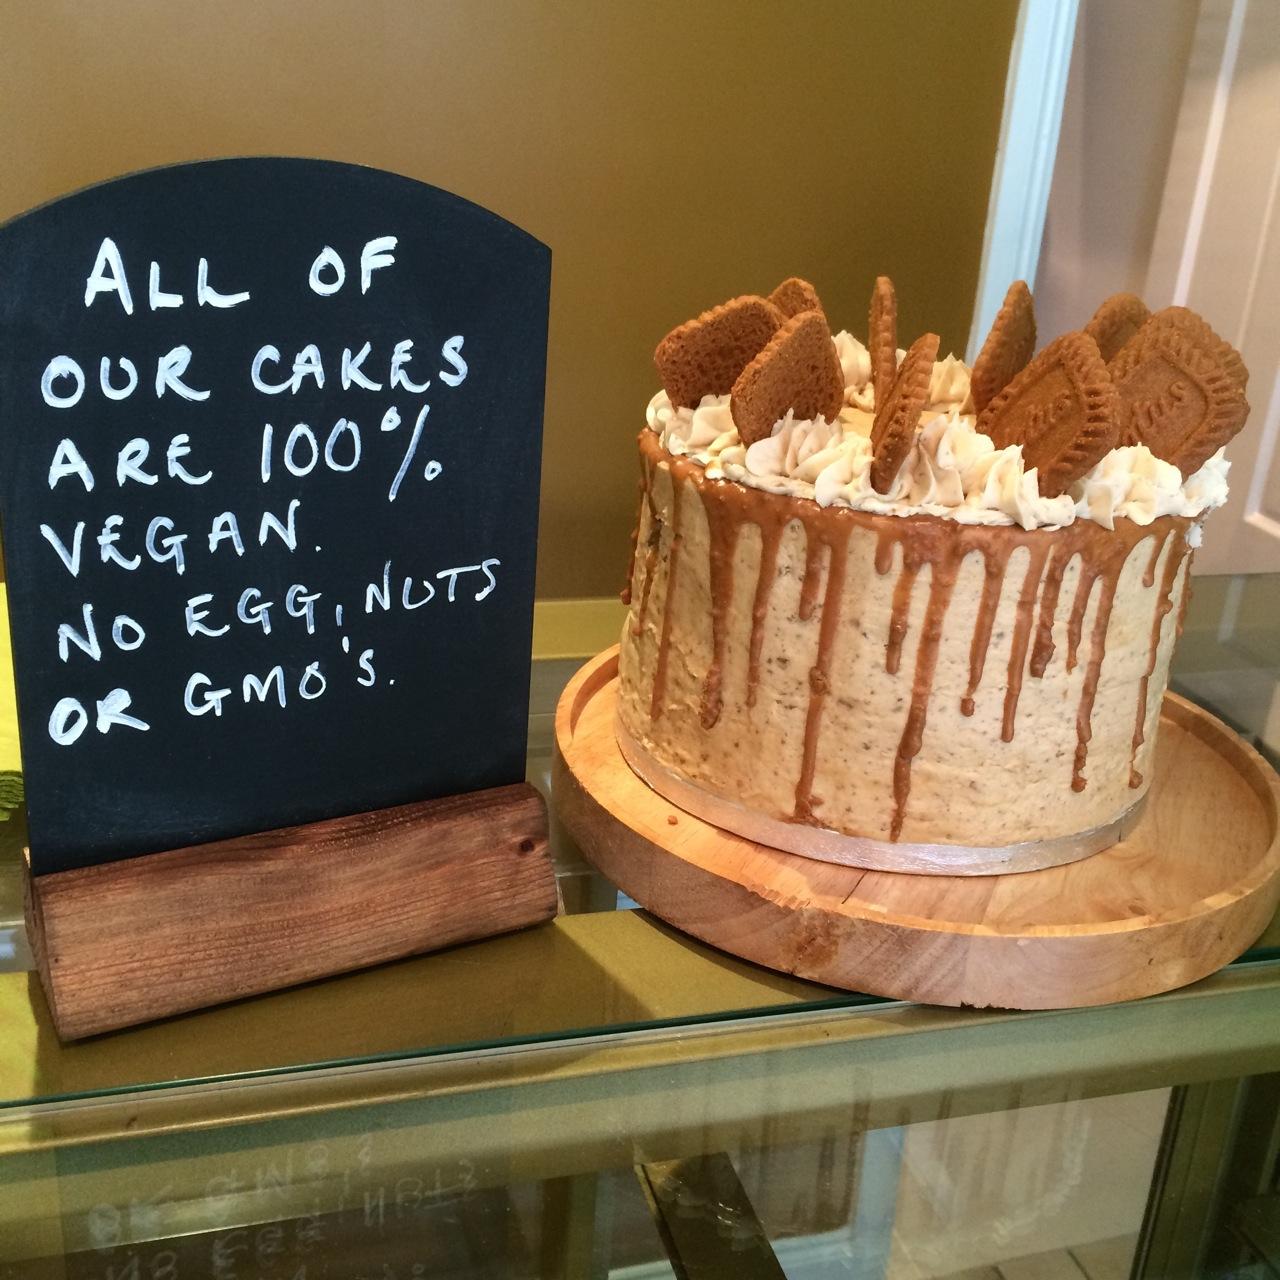 https://i2.wp.com/fatgayvegan.com/wp-content/uploads/2015/05/vegan-cake-and-sign.jpg?fit=1280%2C1280